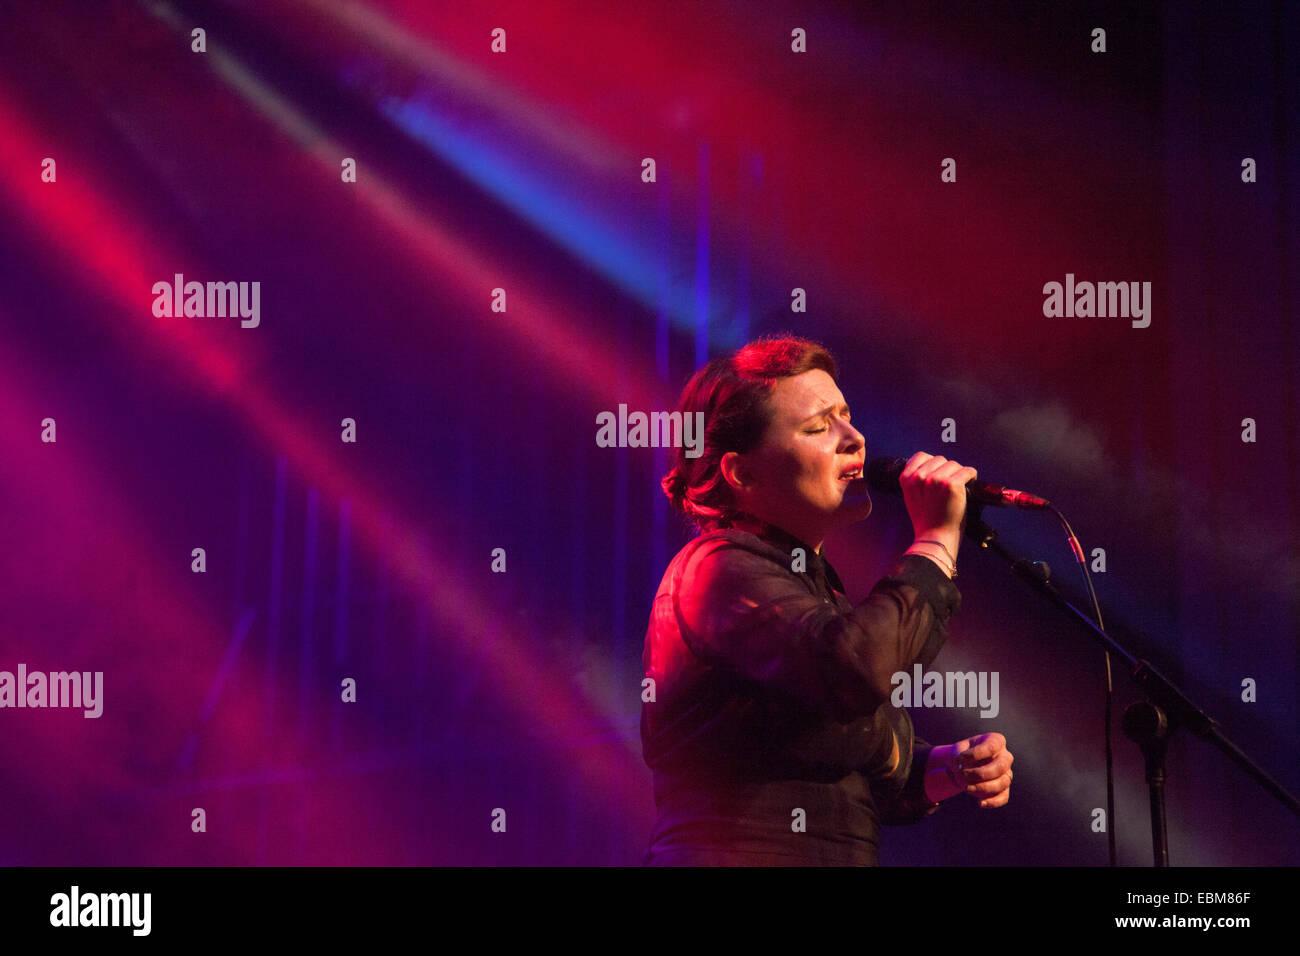 Emiliana Torrini at Ja Ja Ja Festival in London, England 15 November 2014 - Stock Image